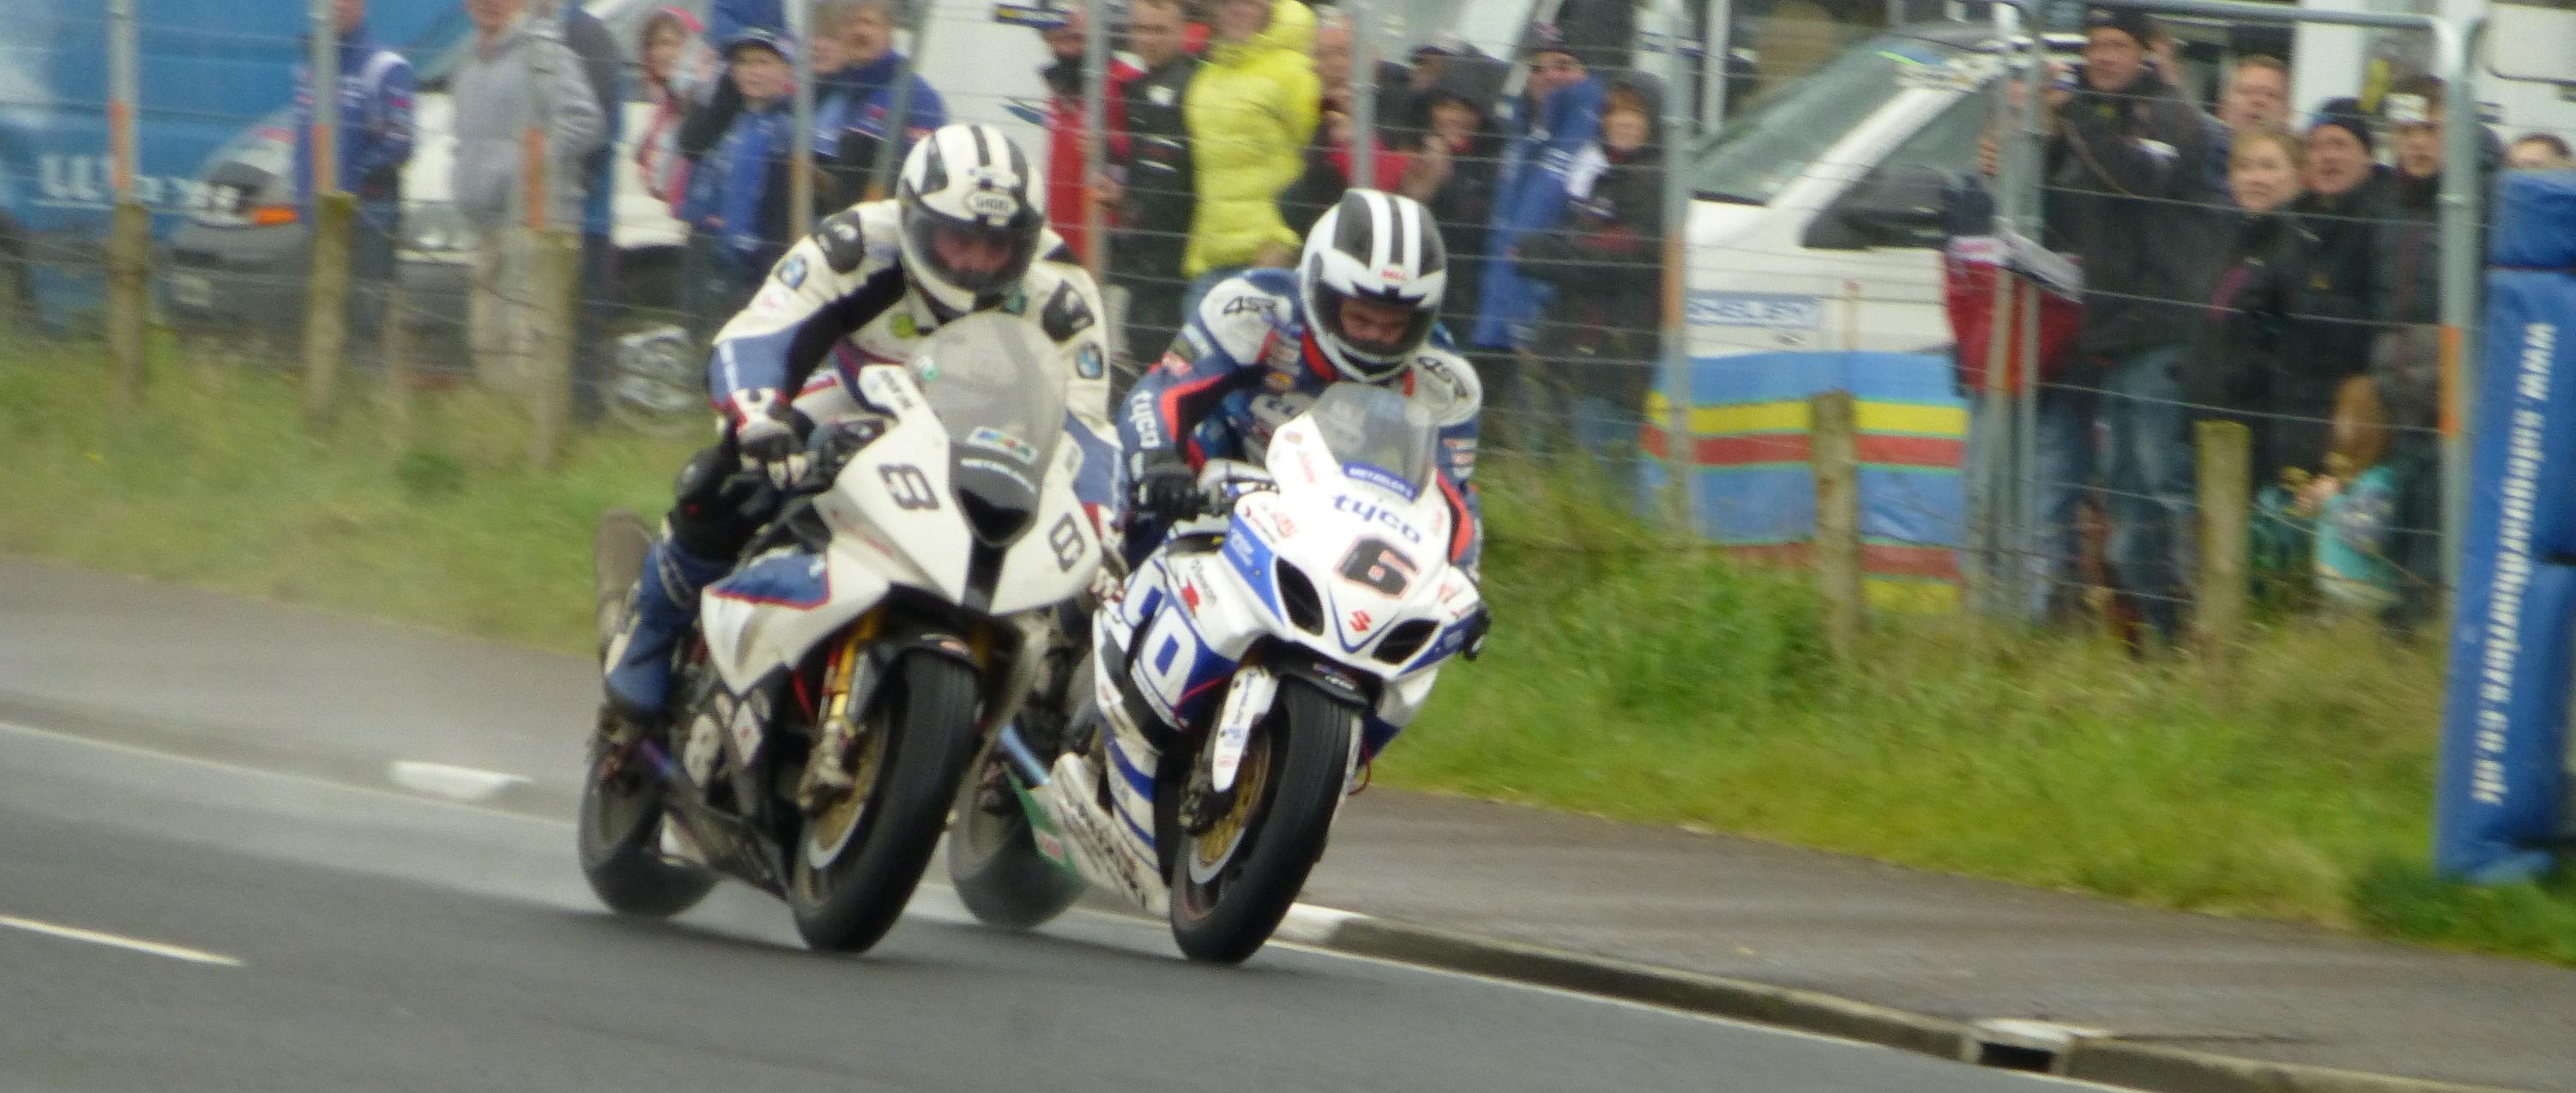 Michael Dunlop v William Dunlop at 2014 NW200